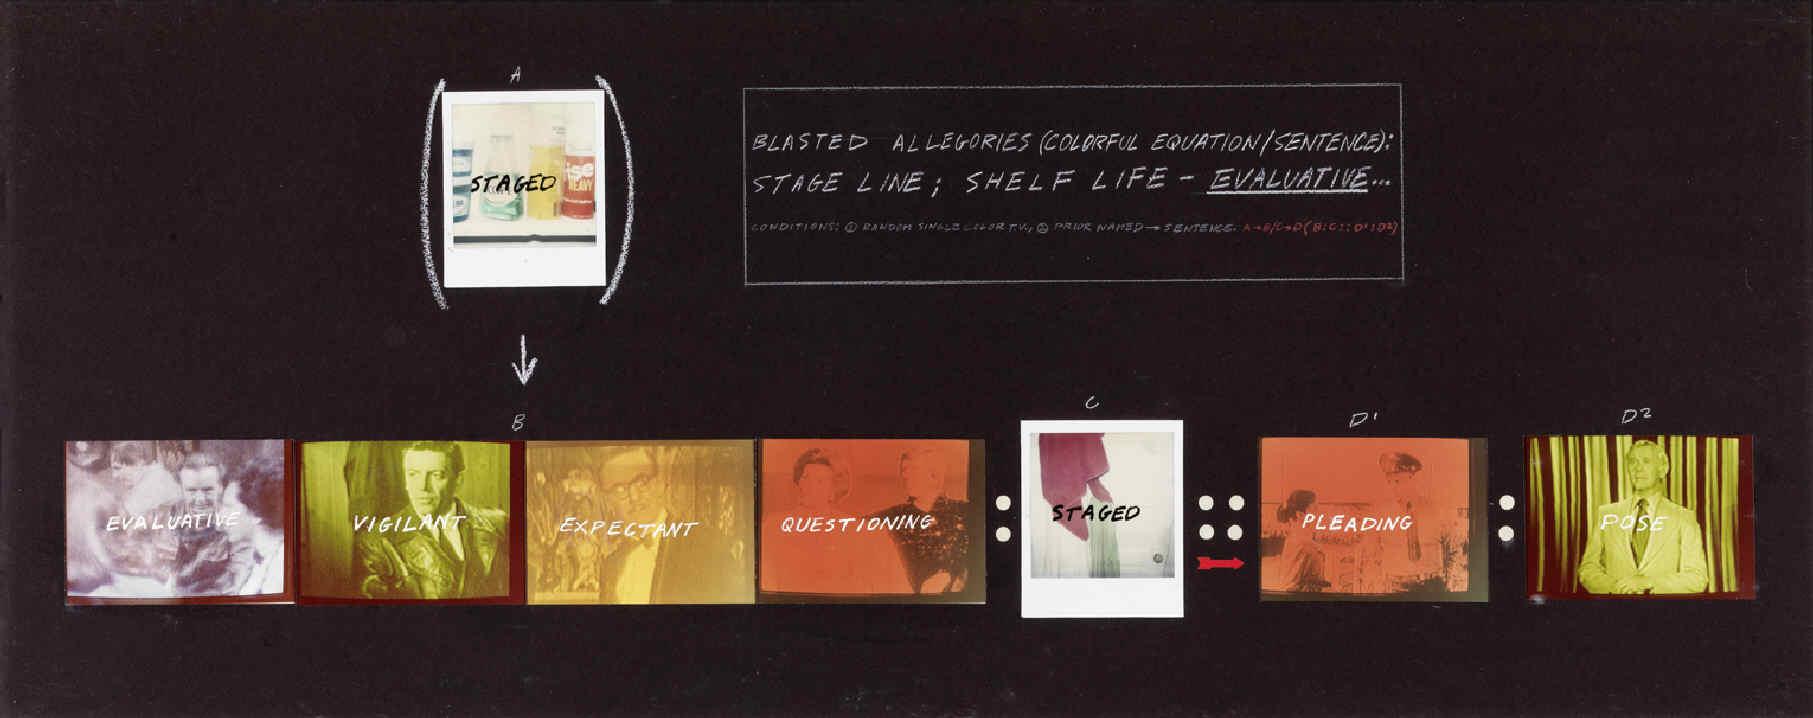 BALDESSARI, John, <i>Blasted Allegories (Colorful Equation/Sentence): Stage Line; Semi-Colon Shelf Life-Evaluative</i>